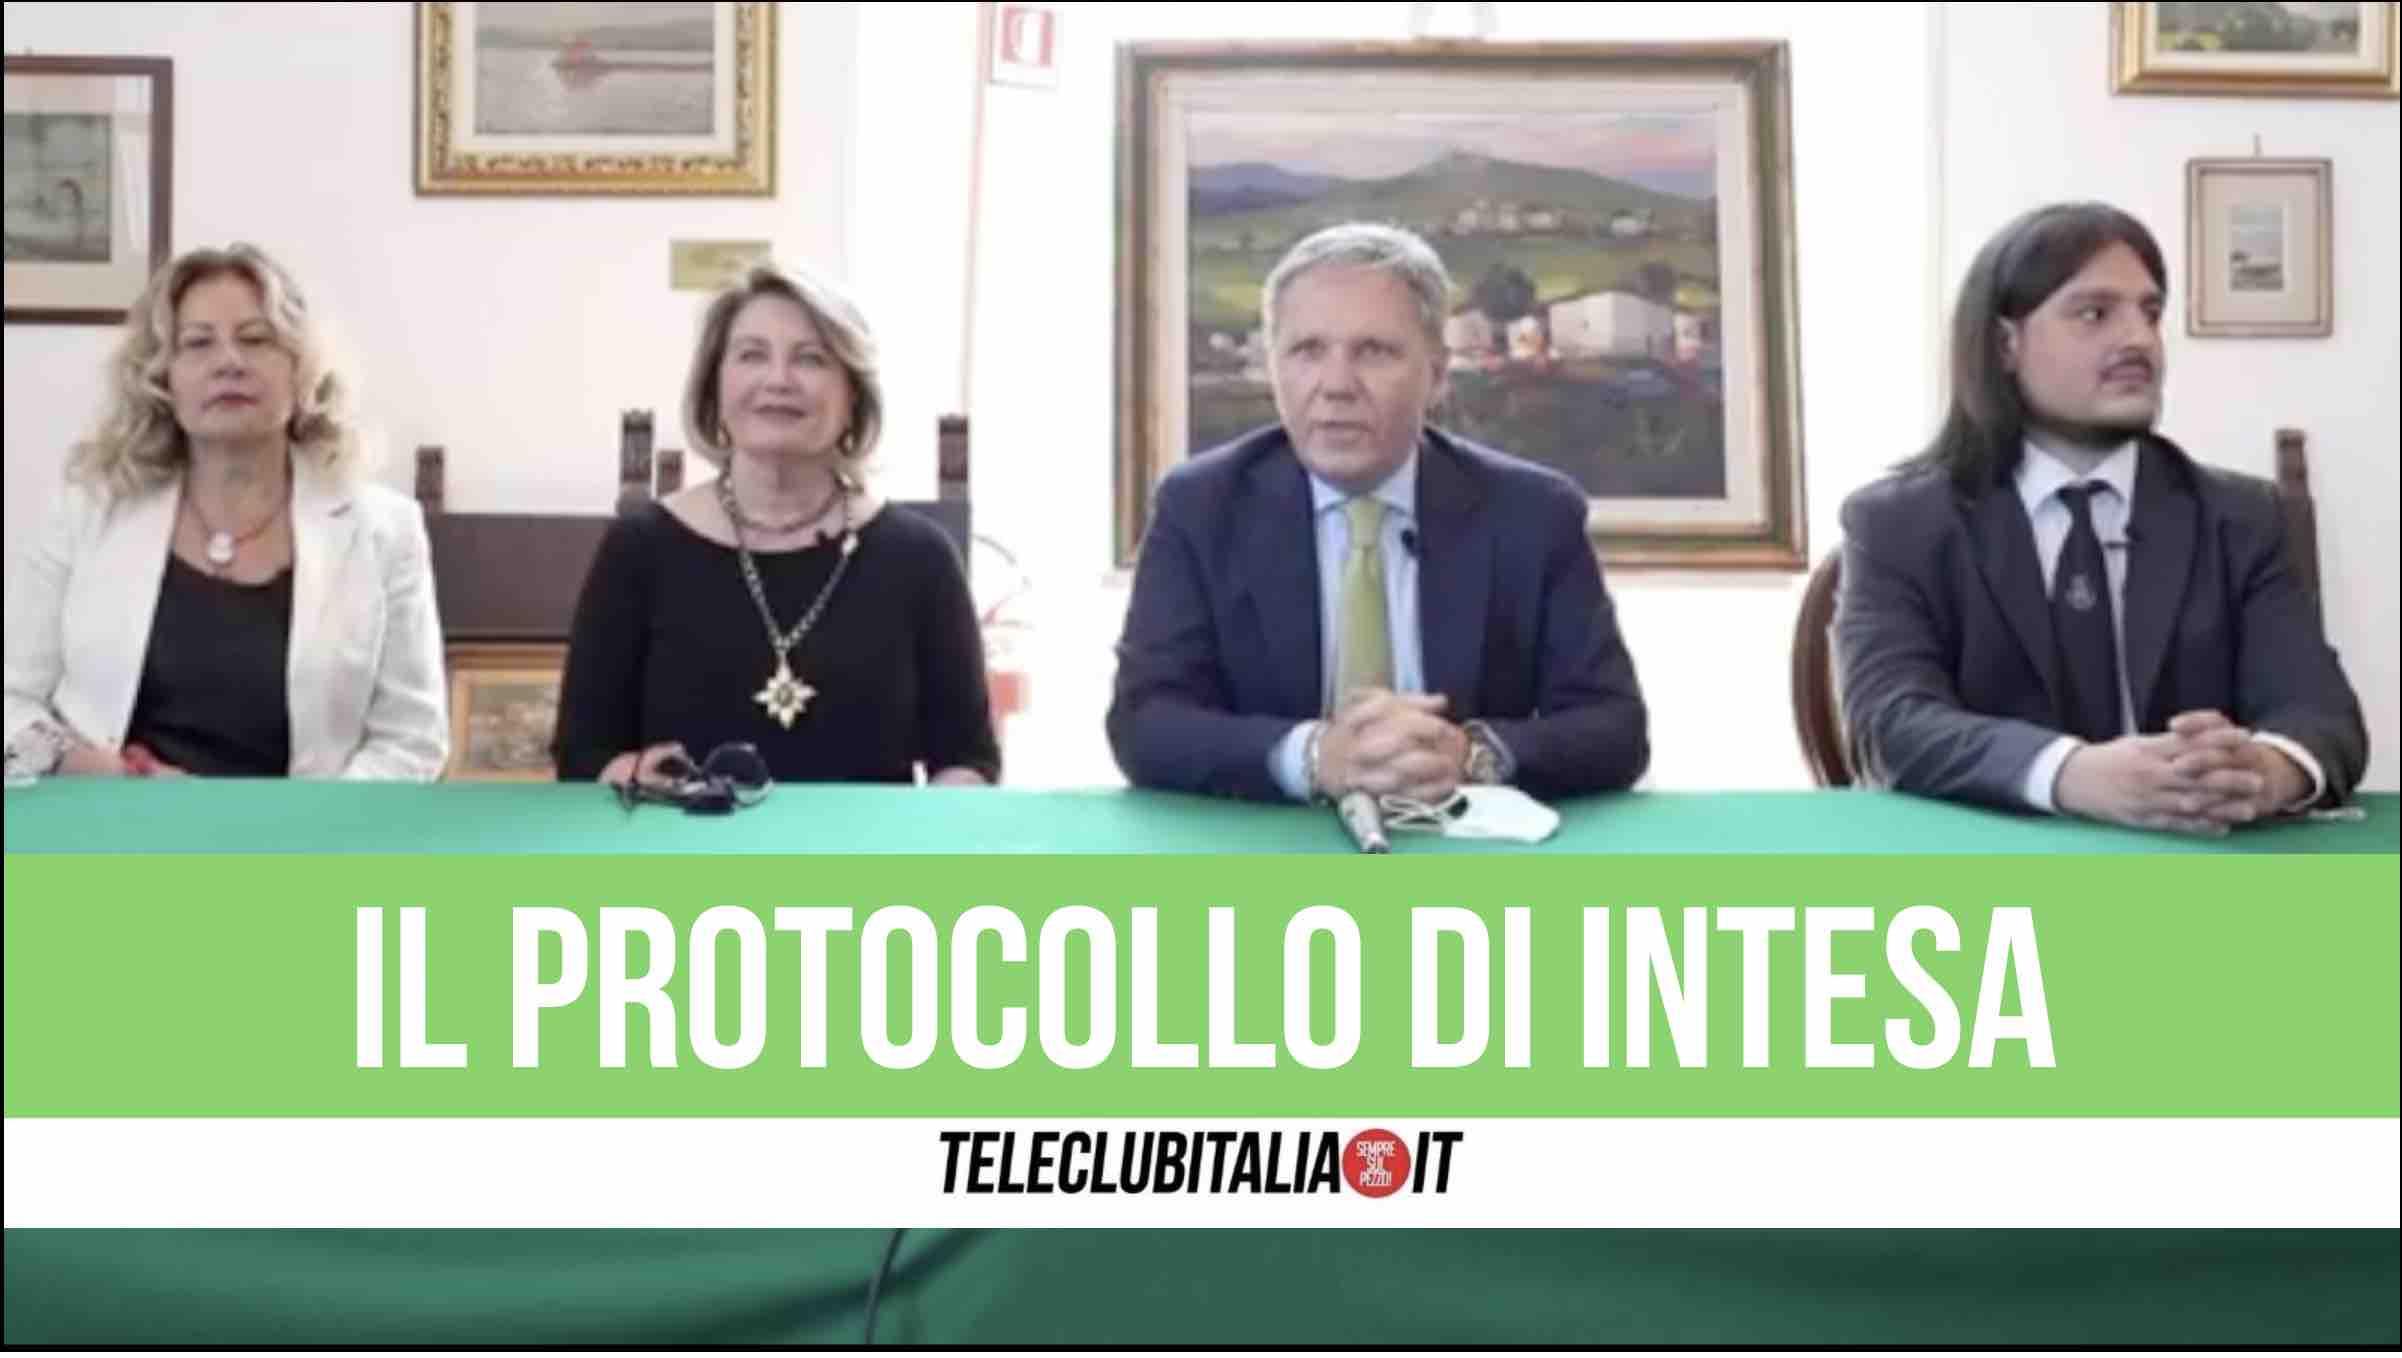 protocollo intesa asl napoli 2 nord unesco federico secondo